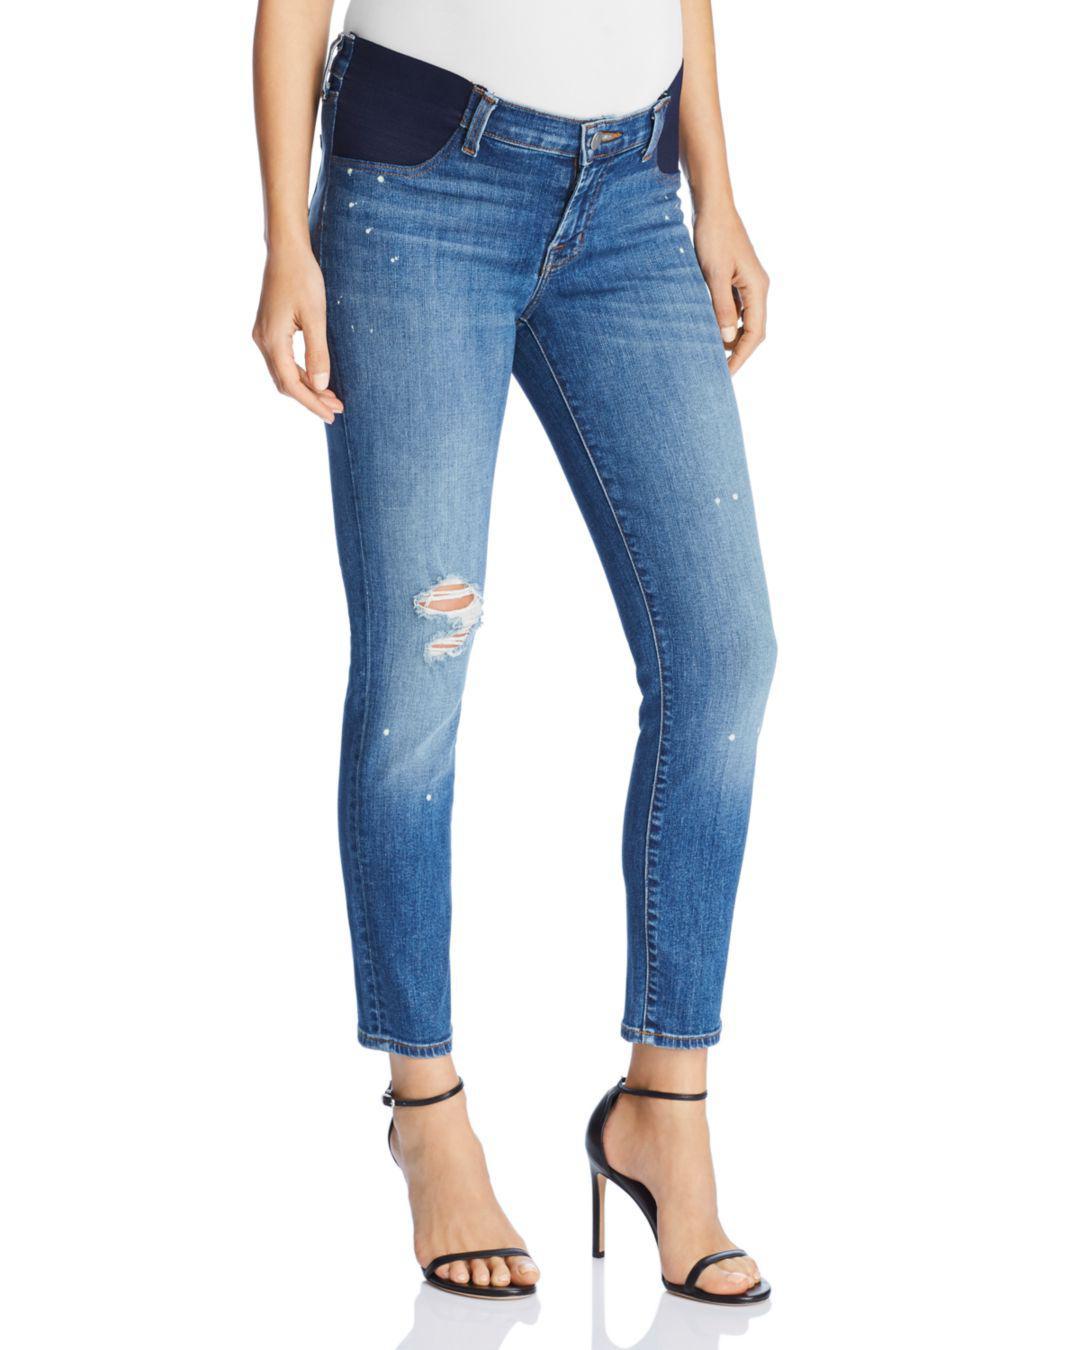 66fc6a8765bec Lyst - J Brand Mama J Skinny Capri Maternity Jeans In Indiana in Blue